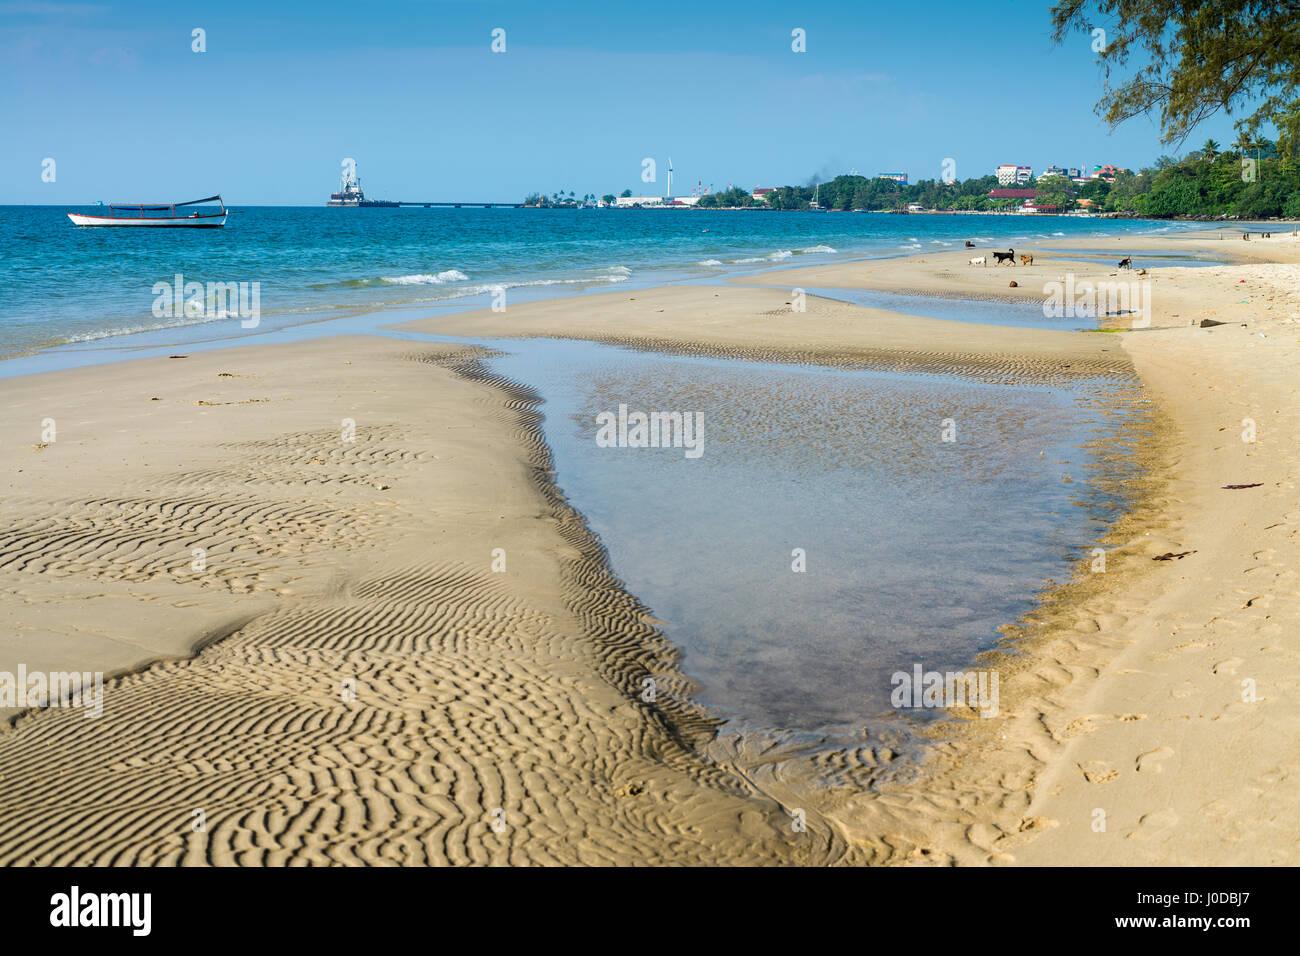 Hawaii Beach in the Sihanouk , Cambodia, Asia. Stock Photo